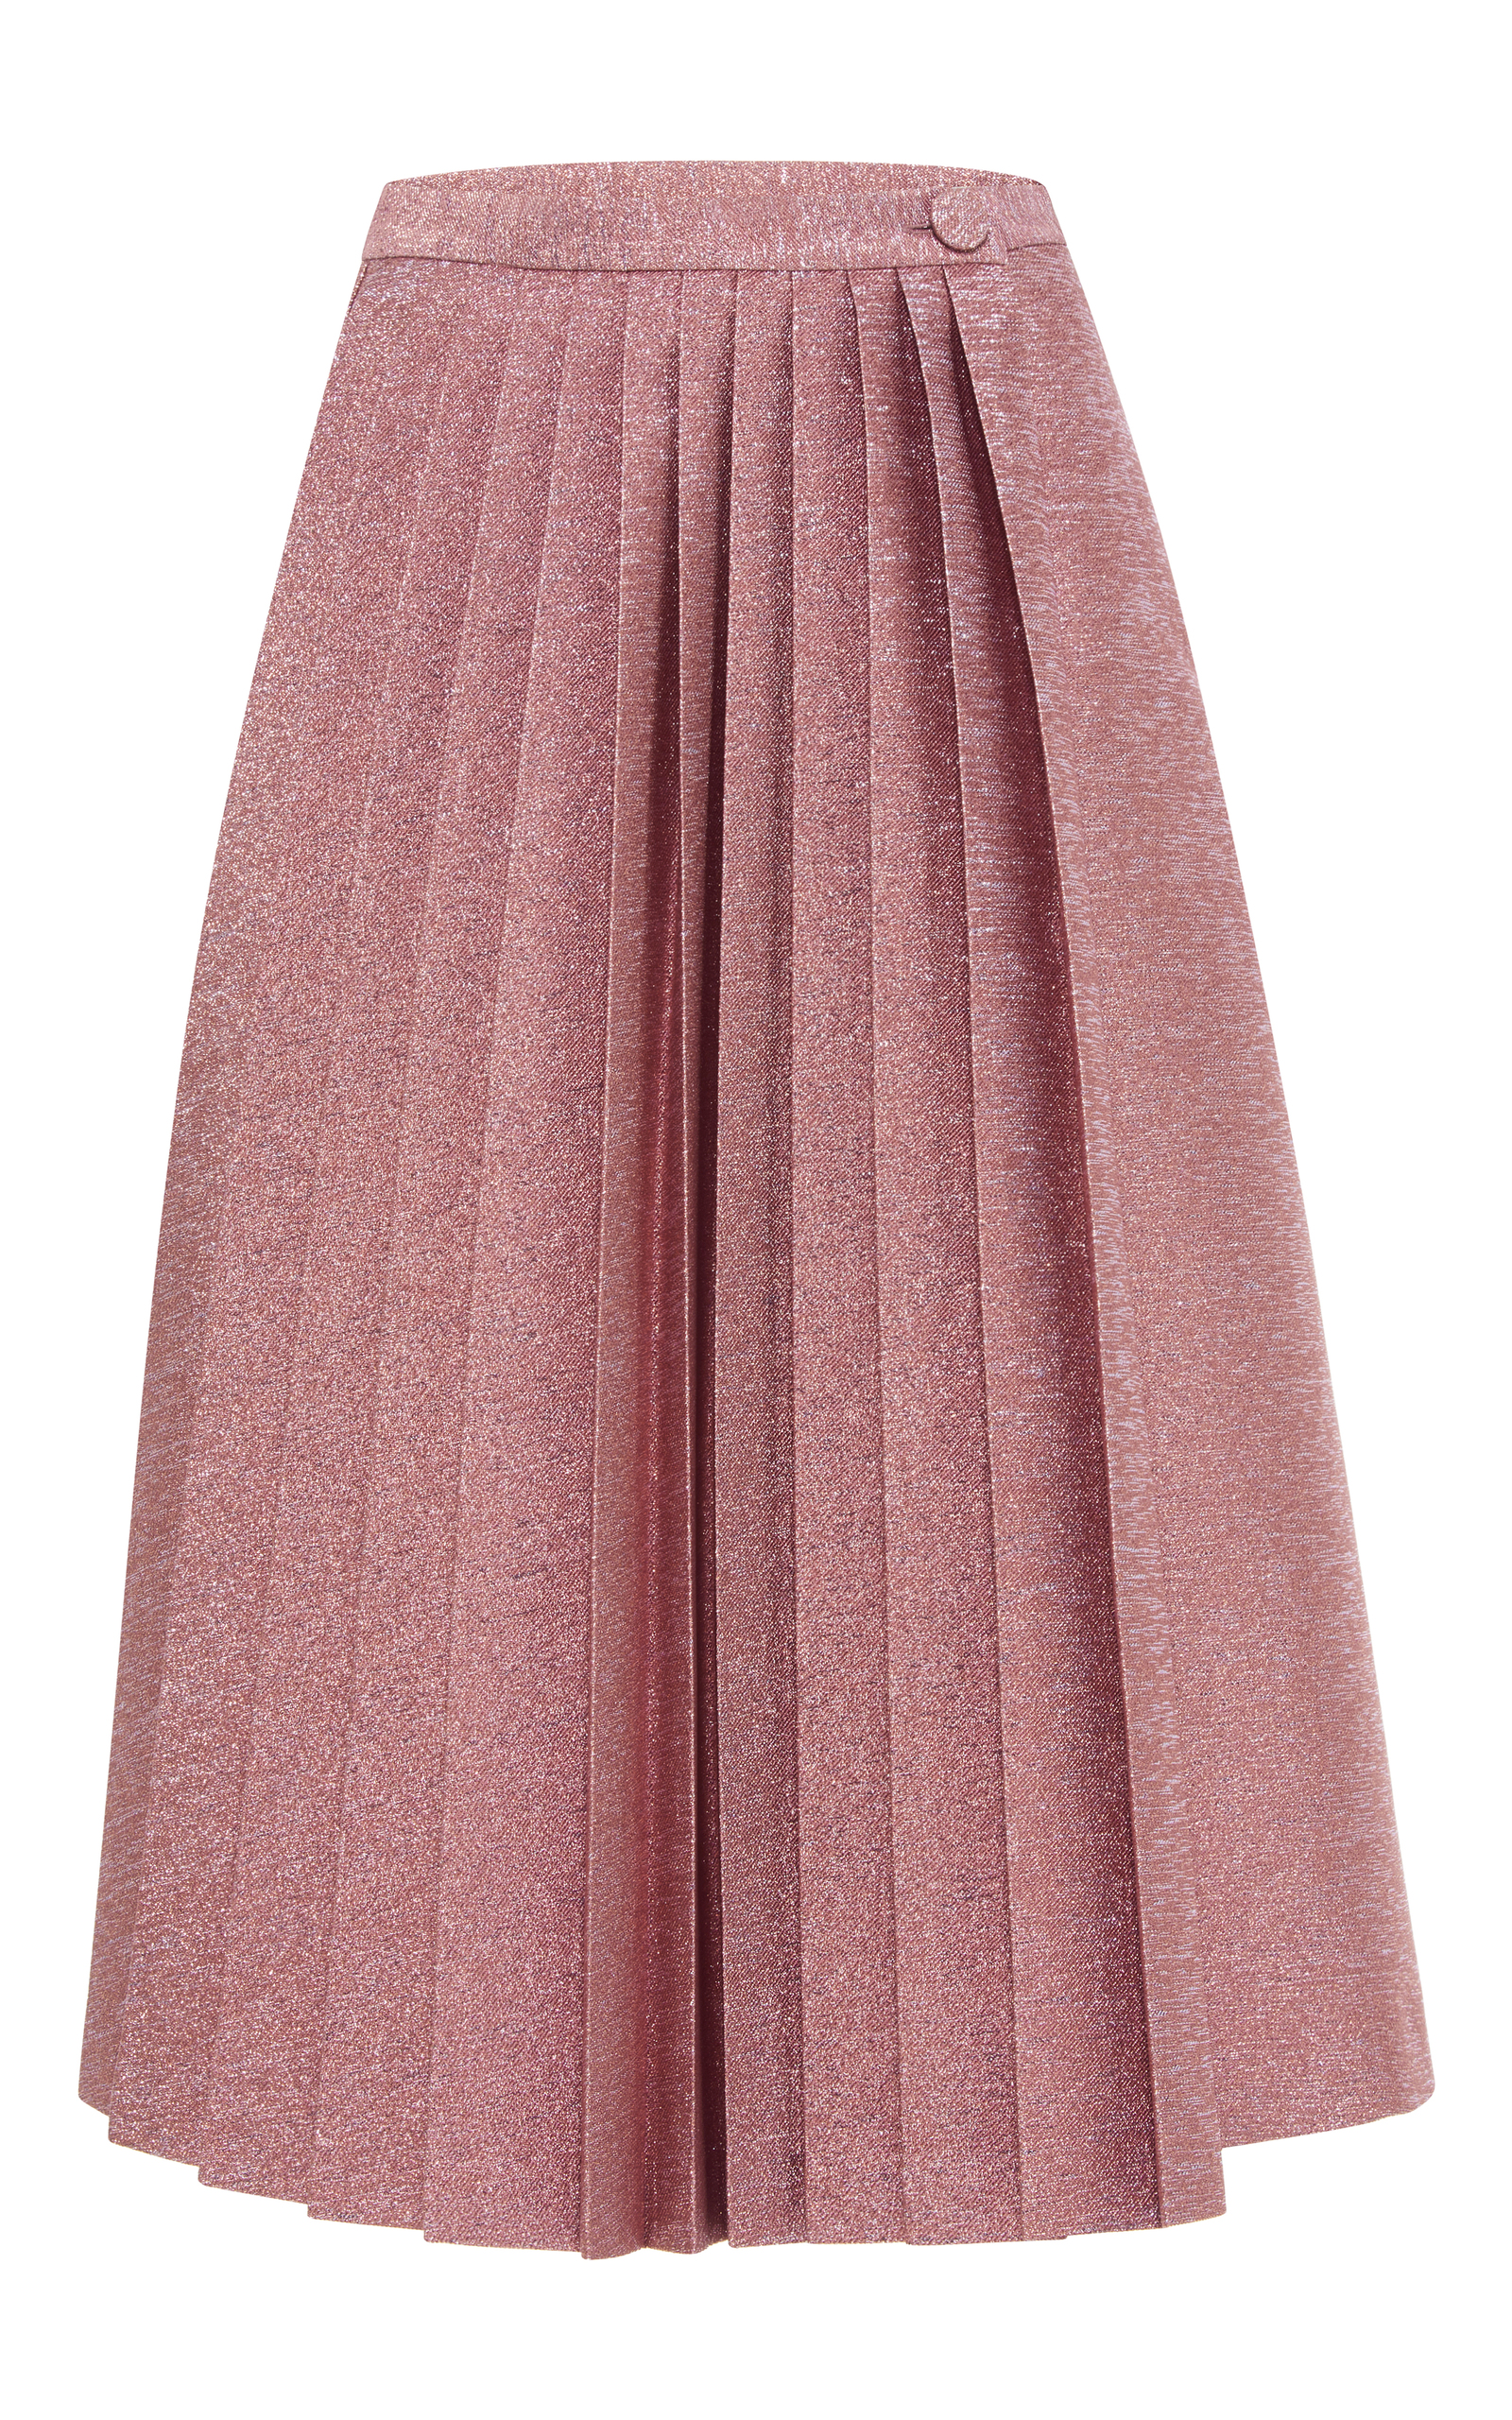 e418ba8158 Wrap-Round Pleated Skirt by Rossella Jardini | Moda Operandi